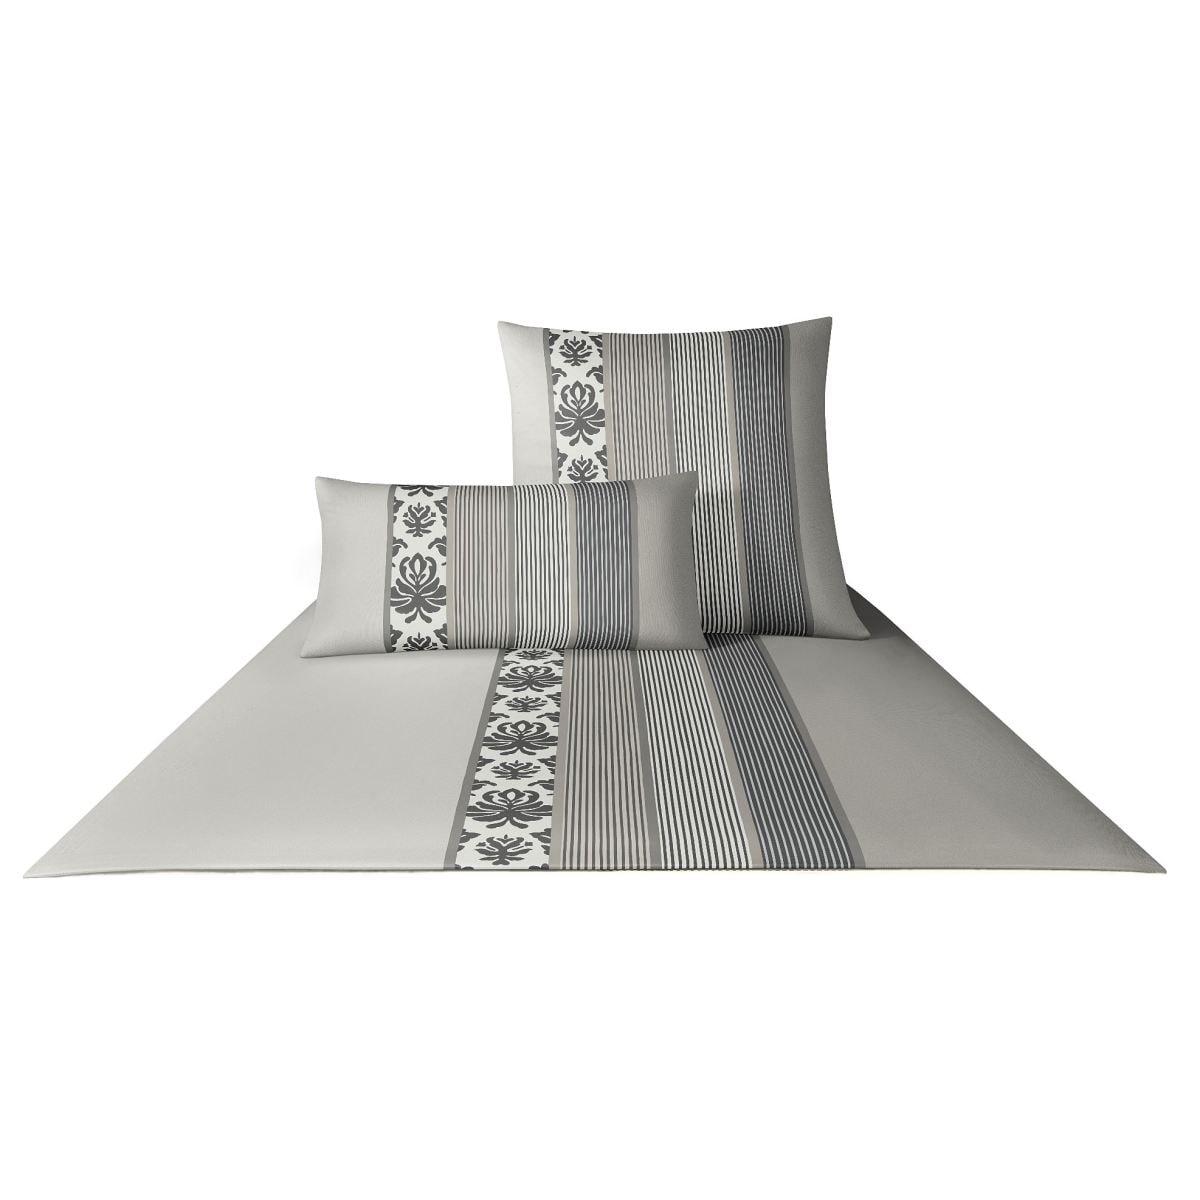 joop designer bettw sche ornament stripes graphit 135 x. Black Bedroom Furniture Sets. Home Design Ideas